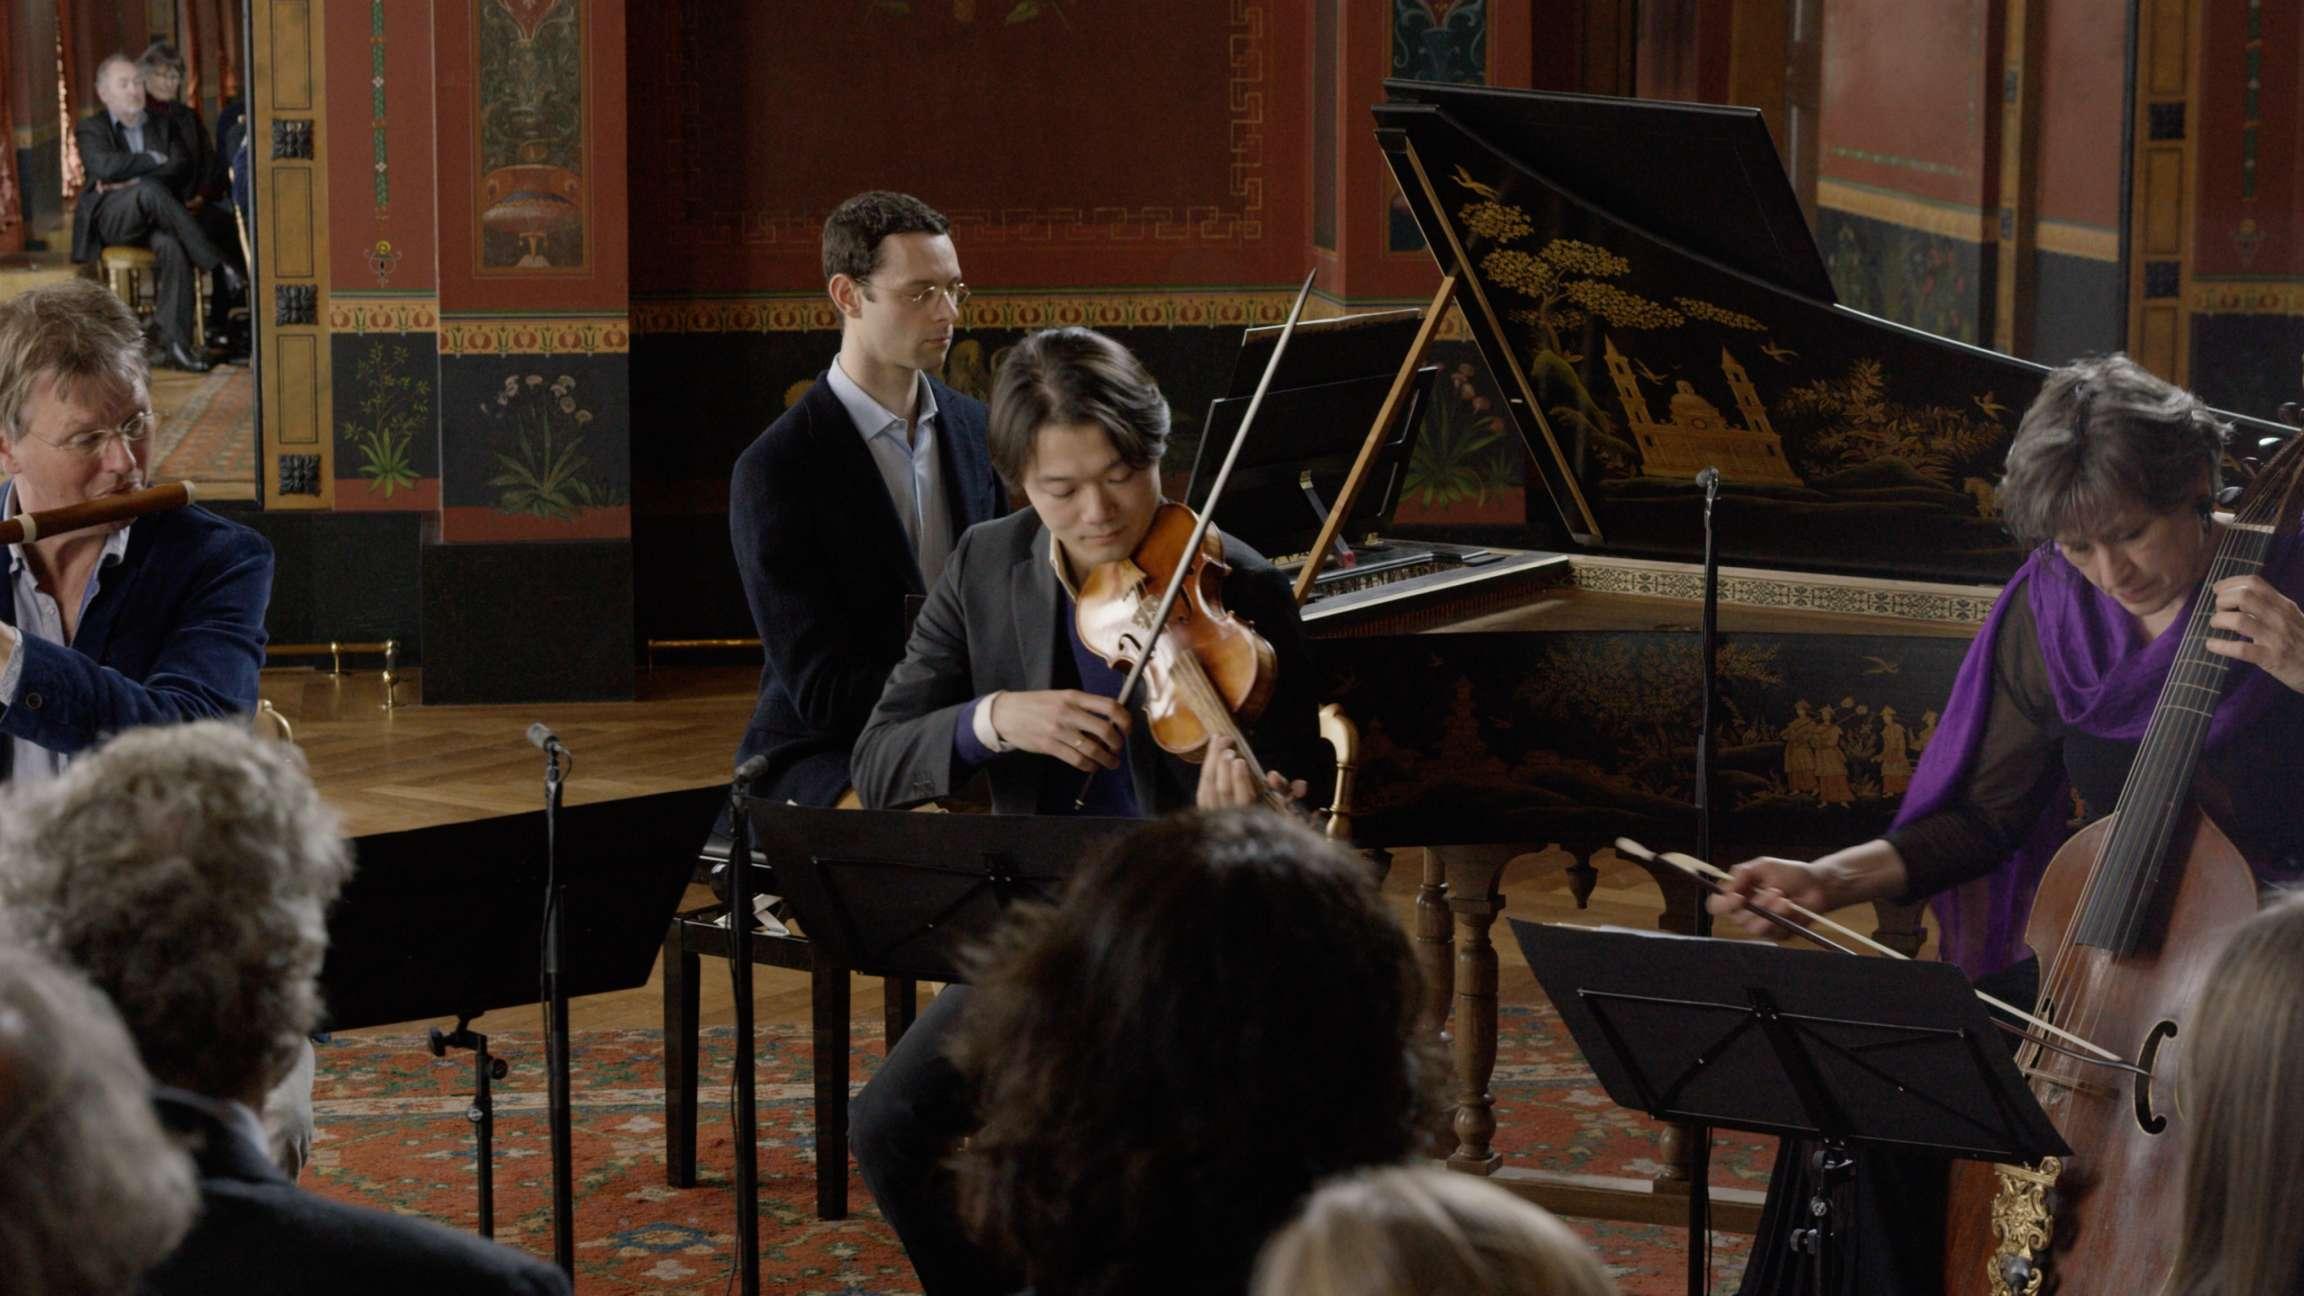 Trio sonata in G major